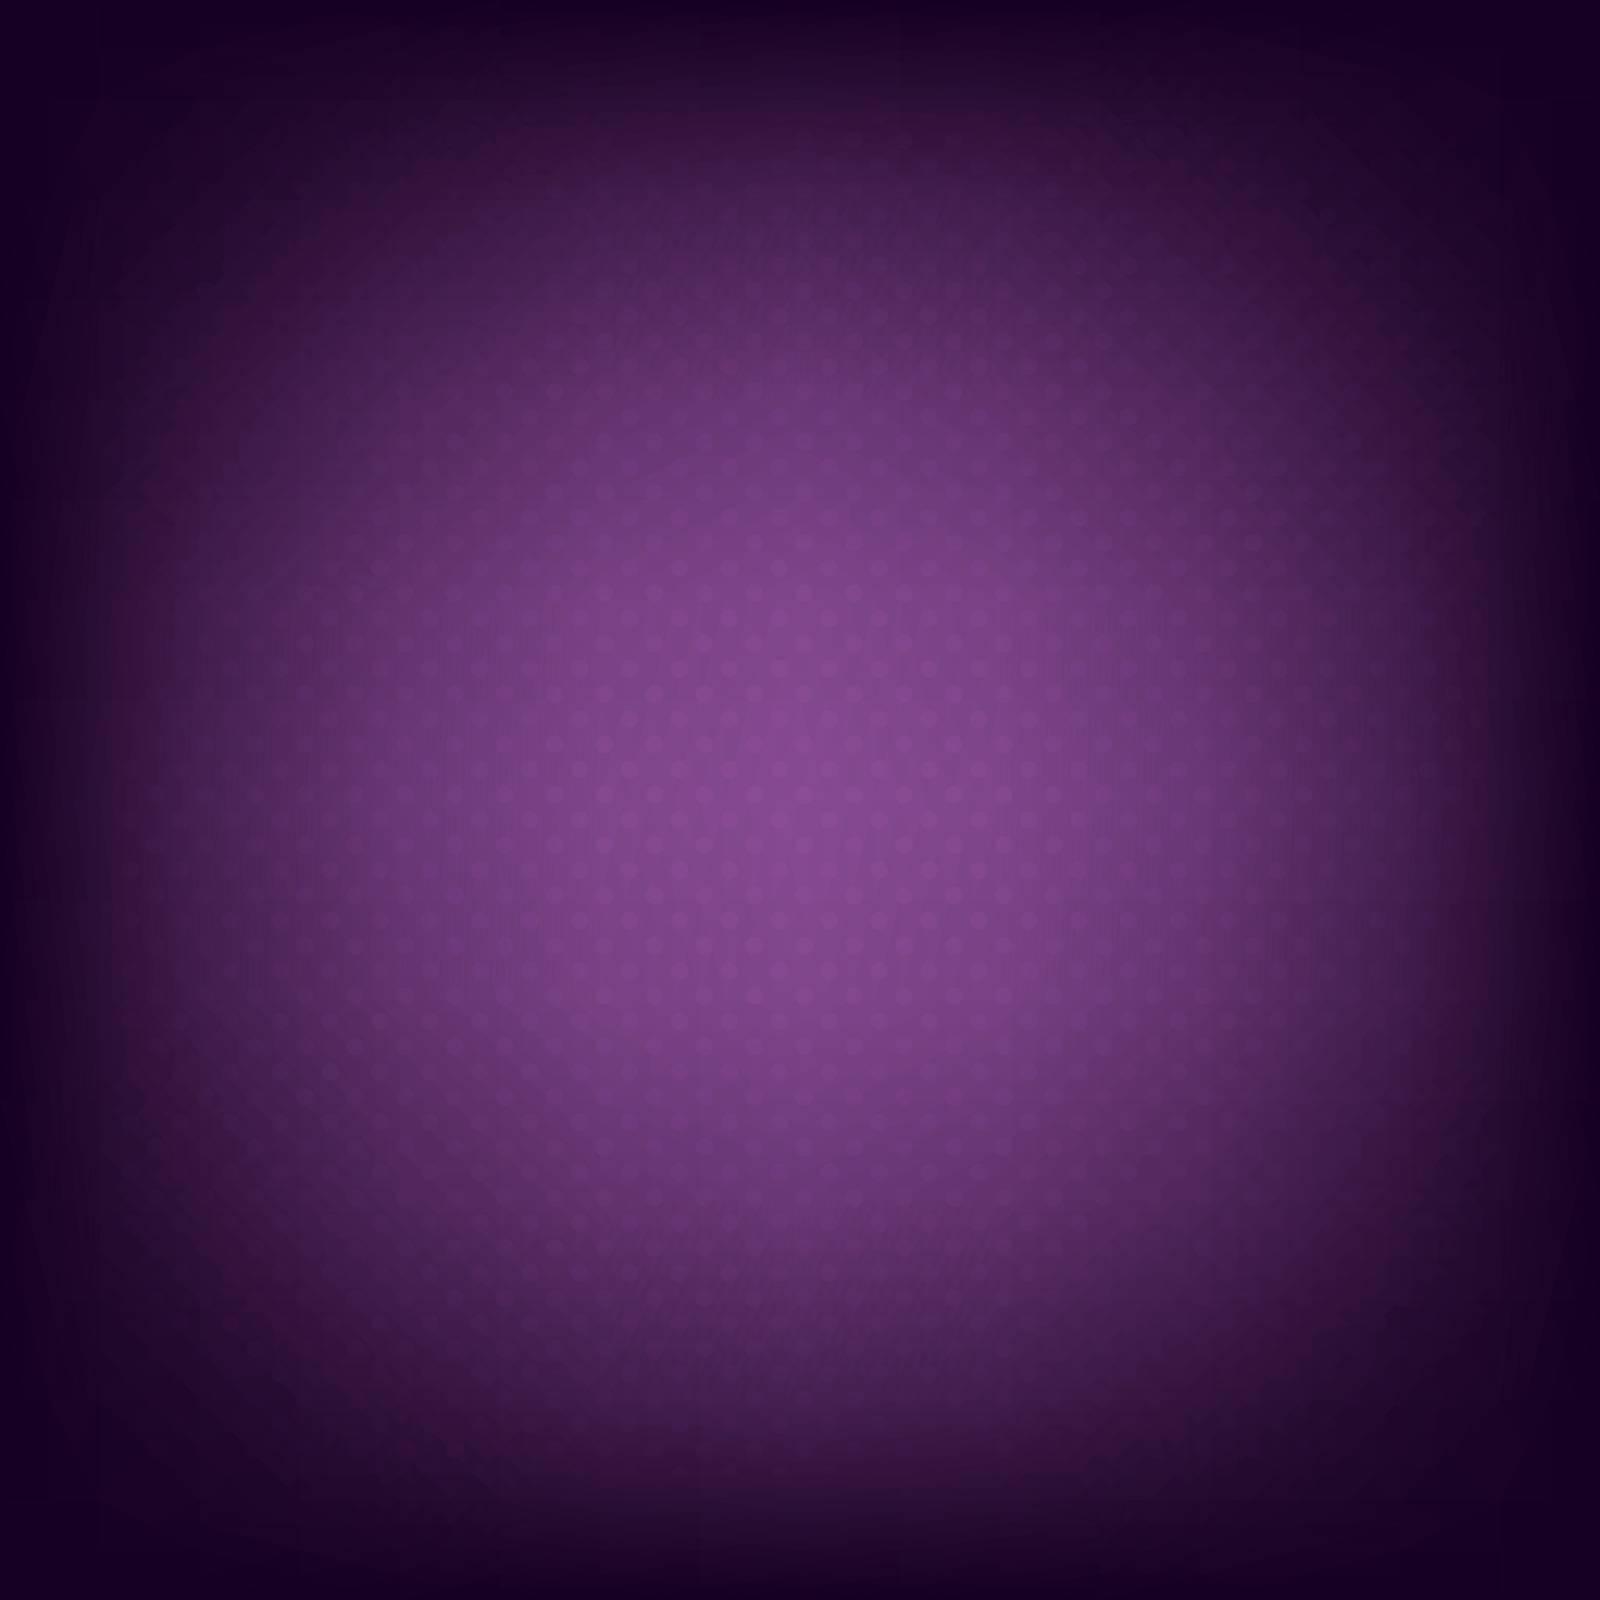 Violet Background With Gradient Mesh, Vector Illustration